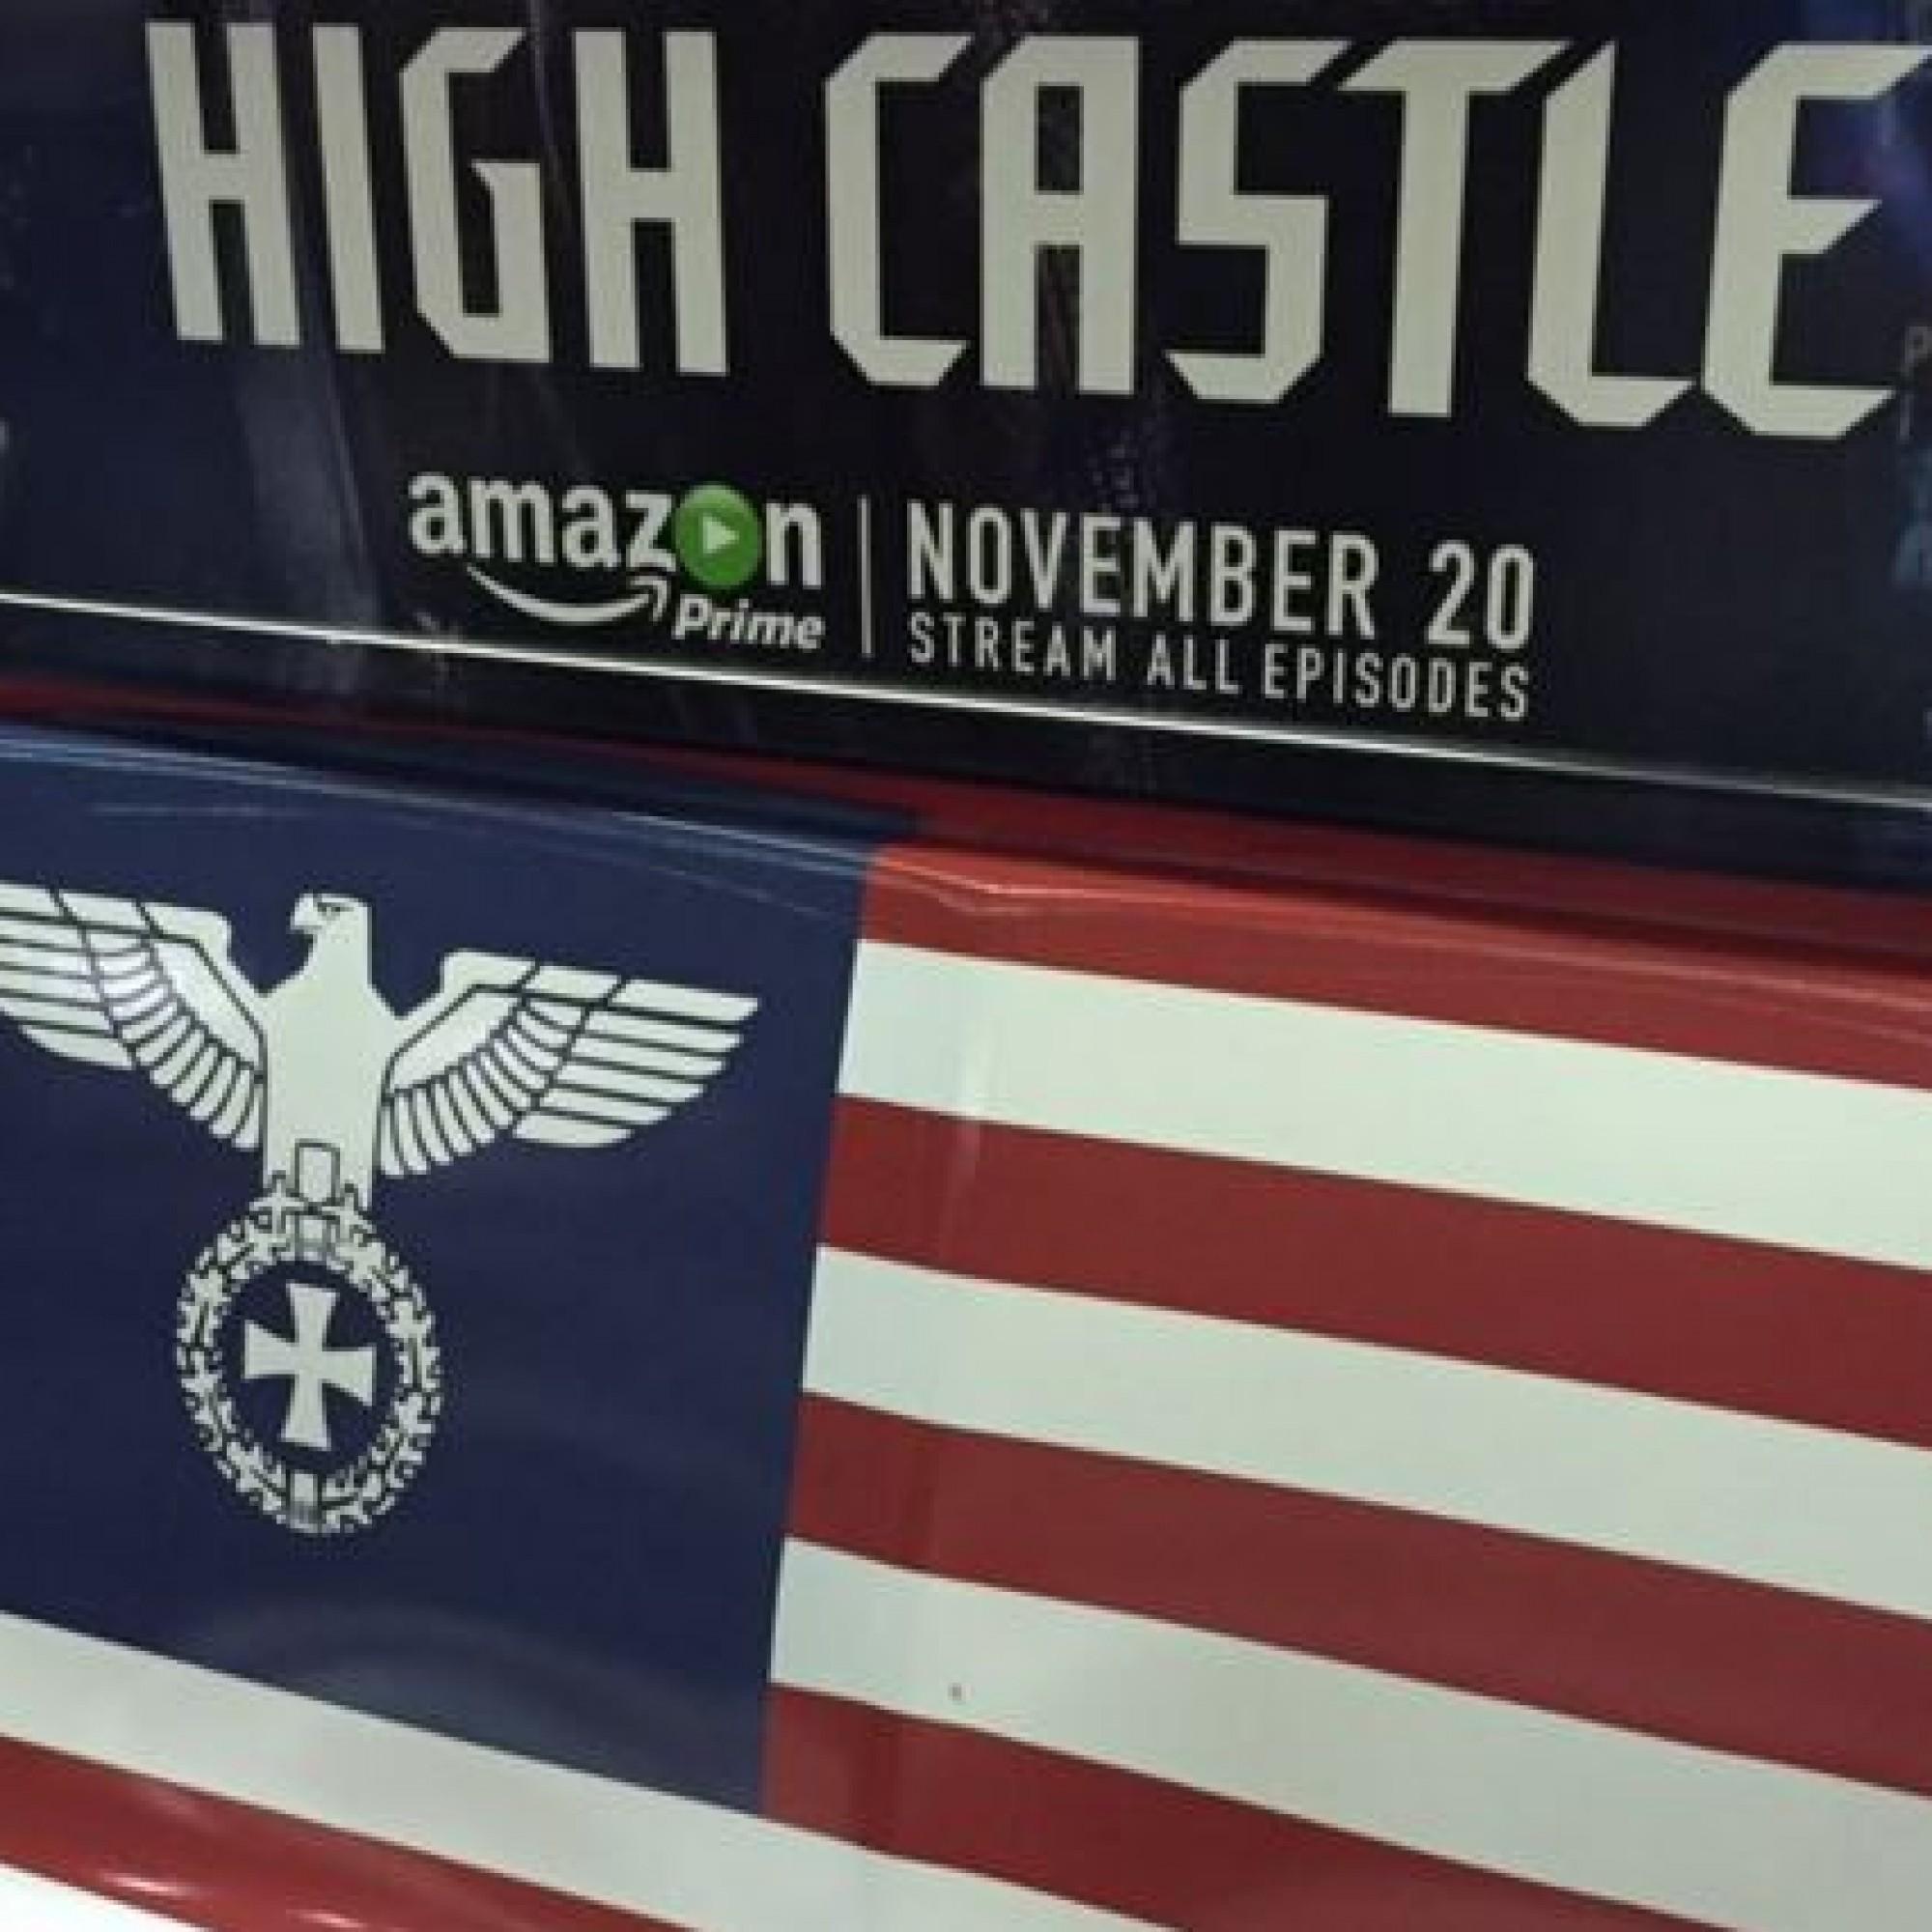 Amazon pulls Nazi ads following backlash in New York